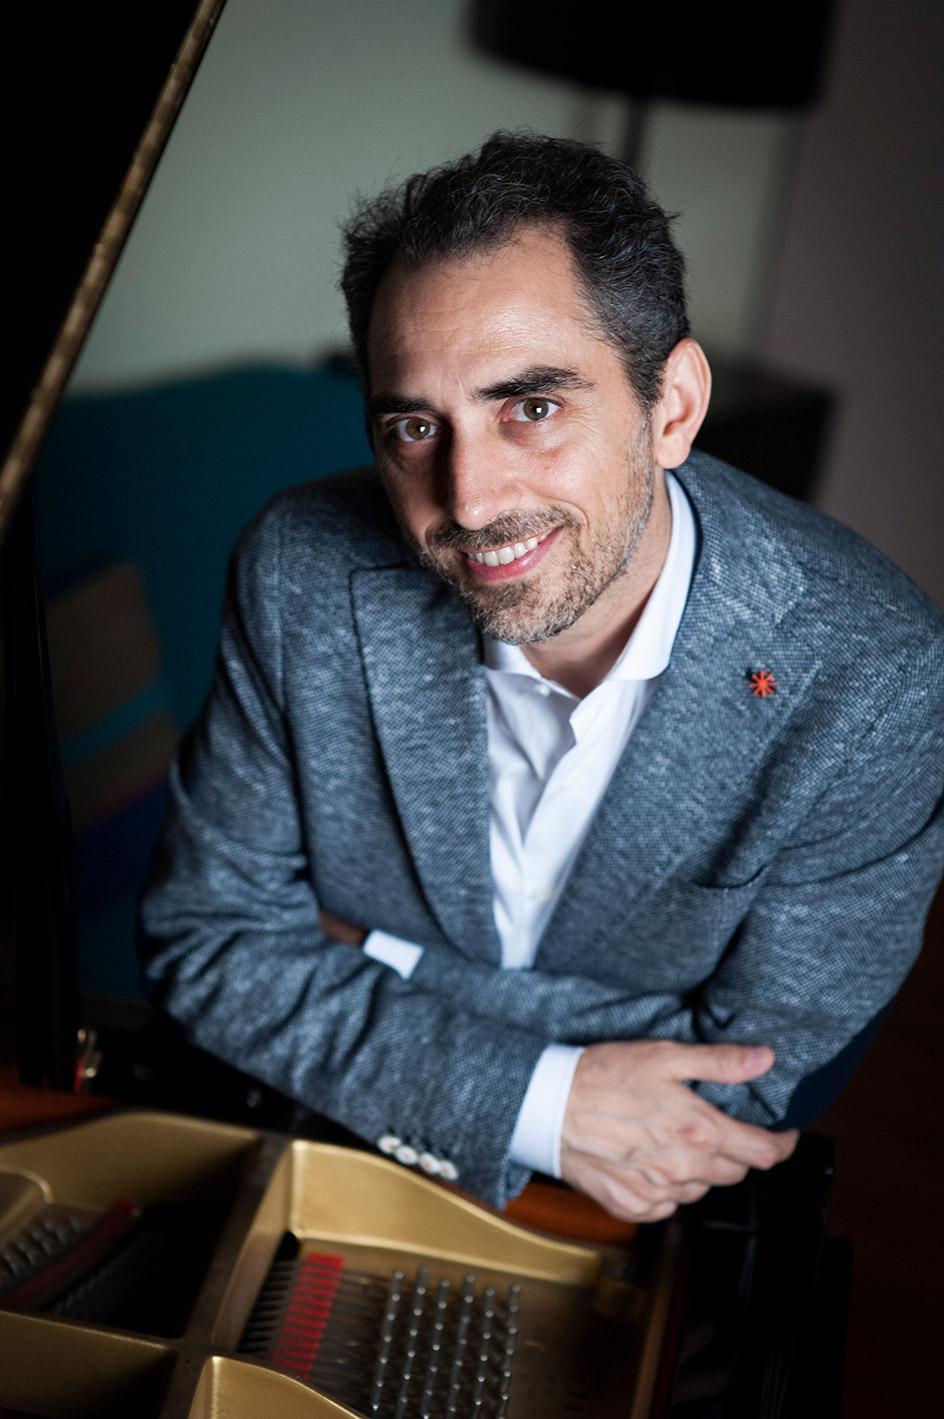 Fabio di Biase pianist piano image